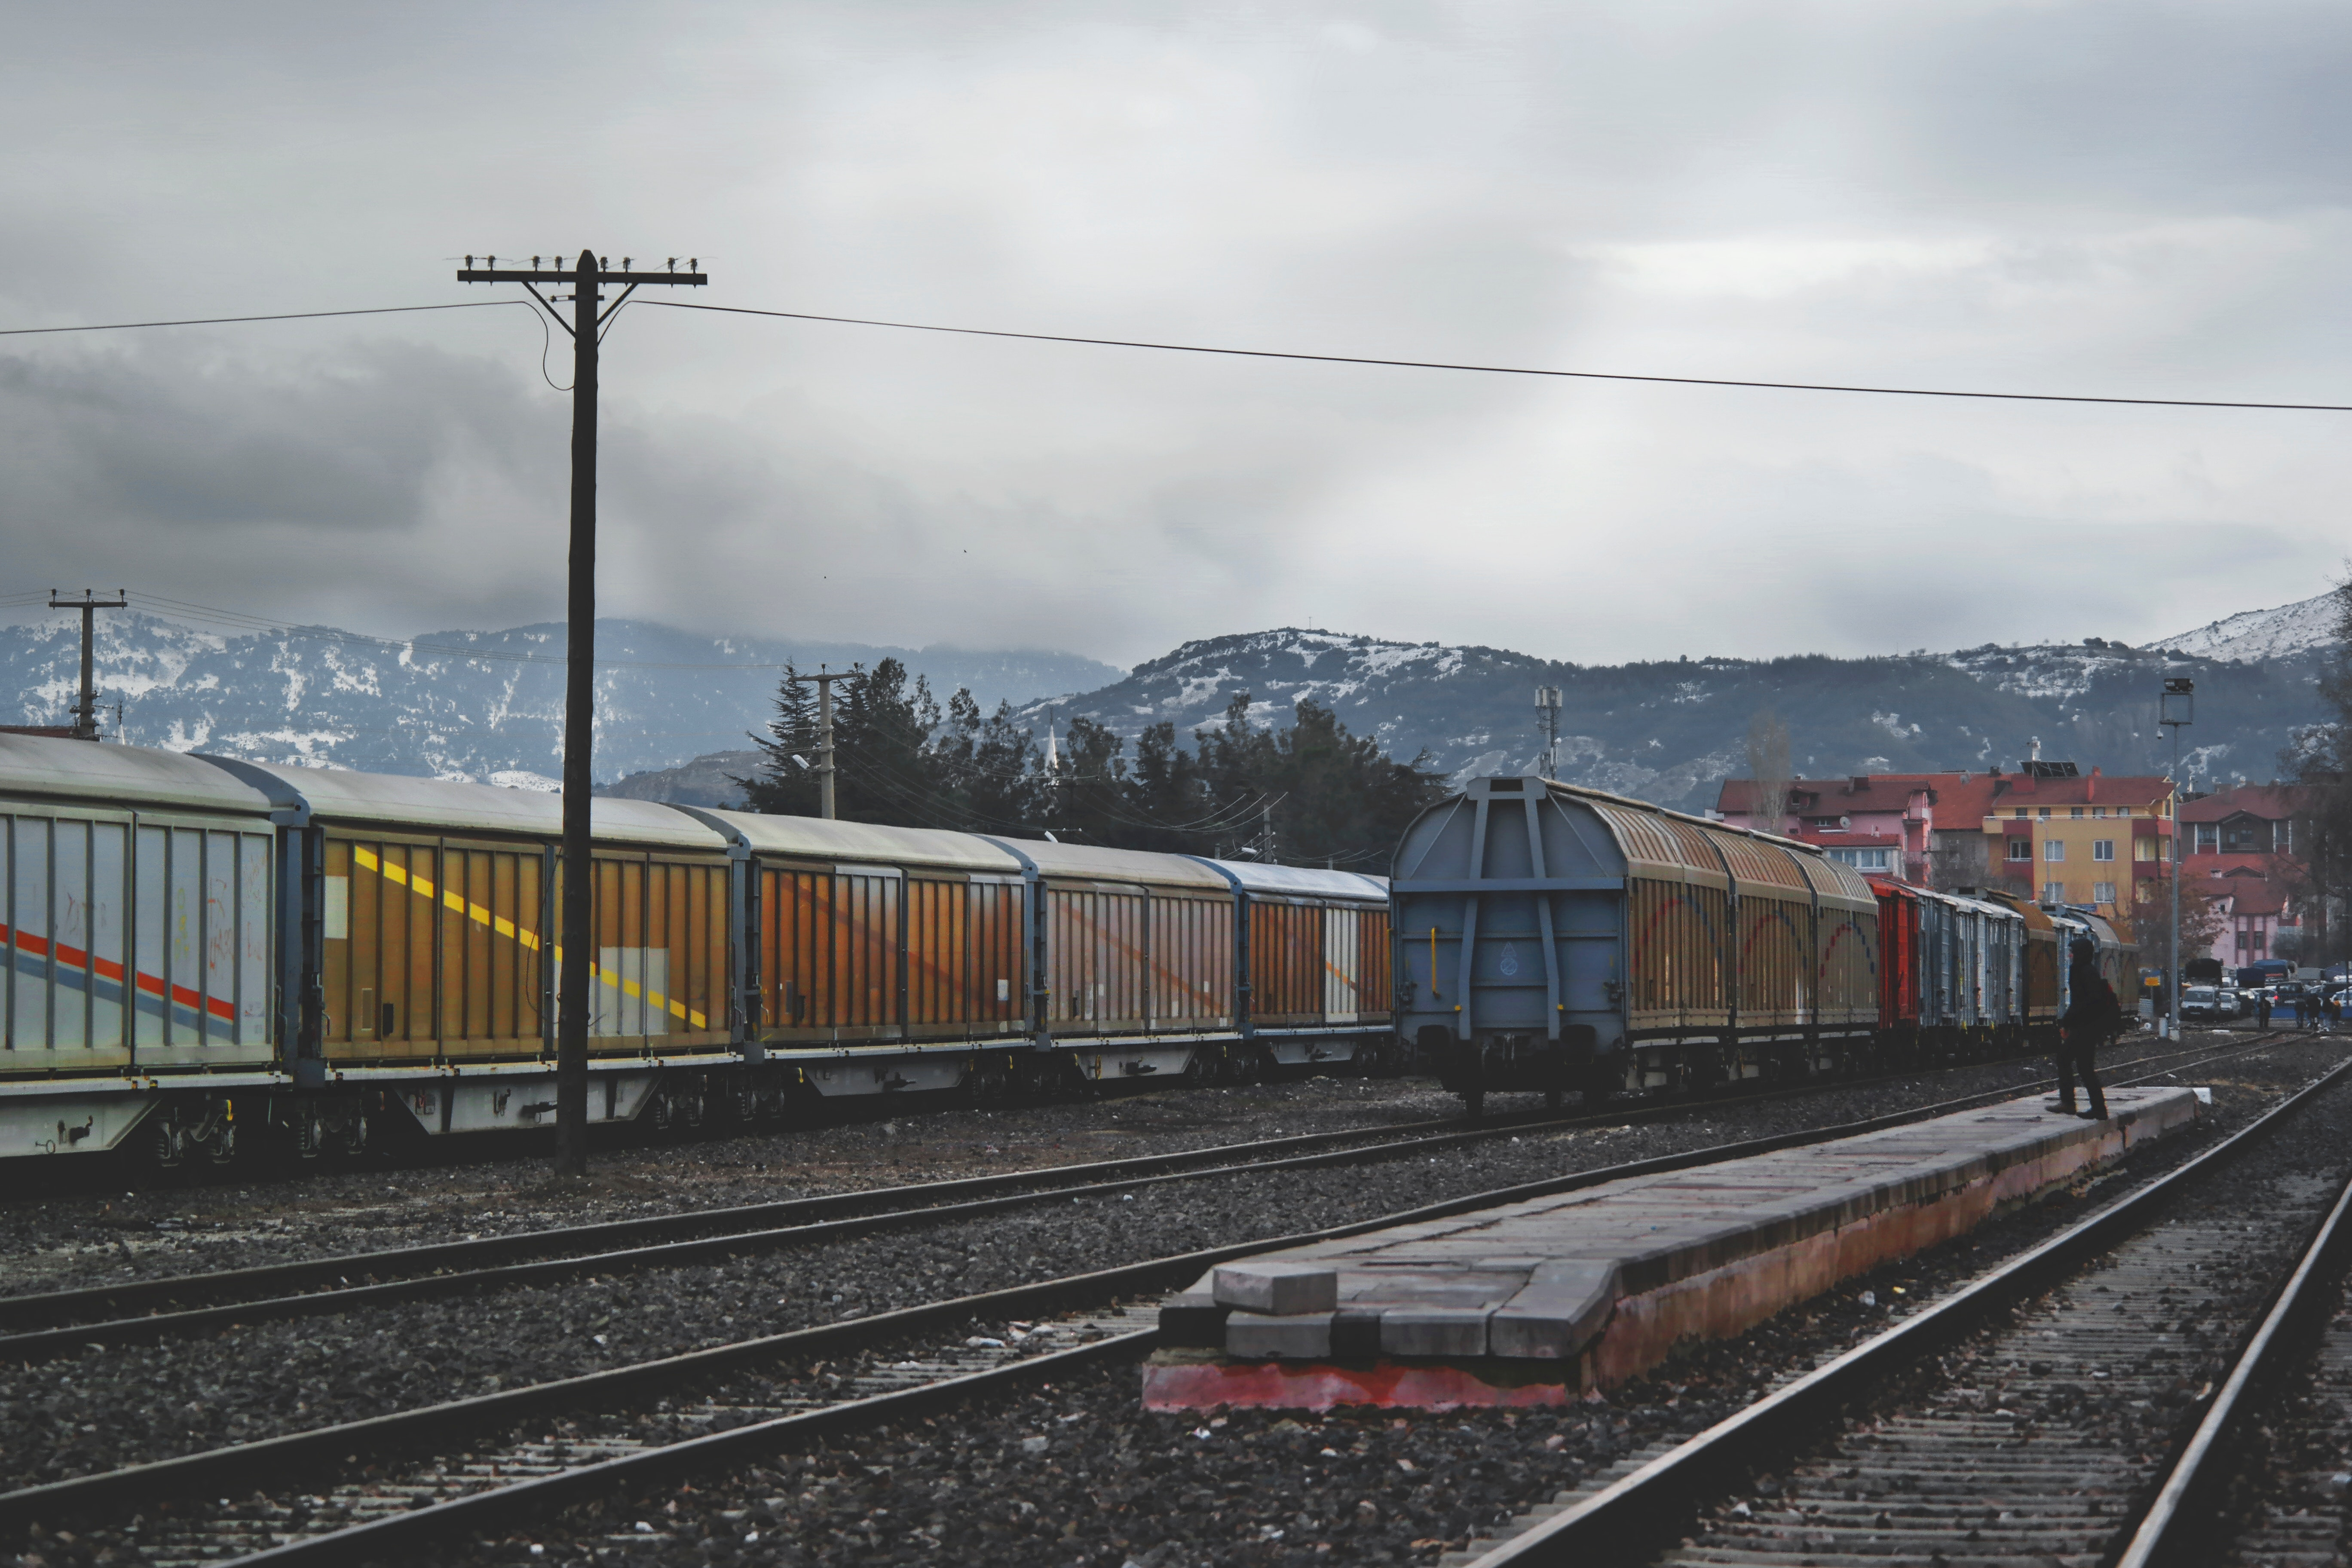 Train running on train track under gray sky at daytime photo